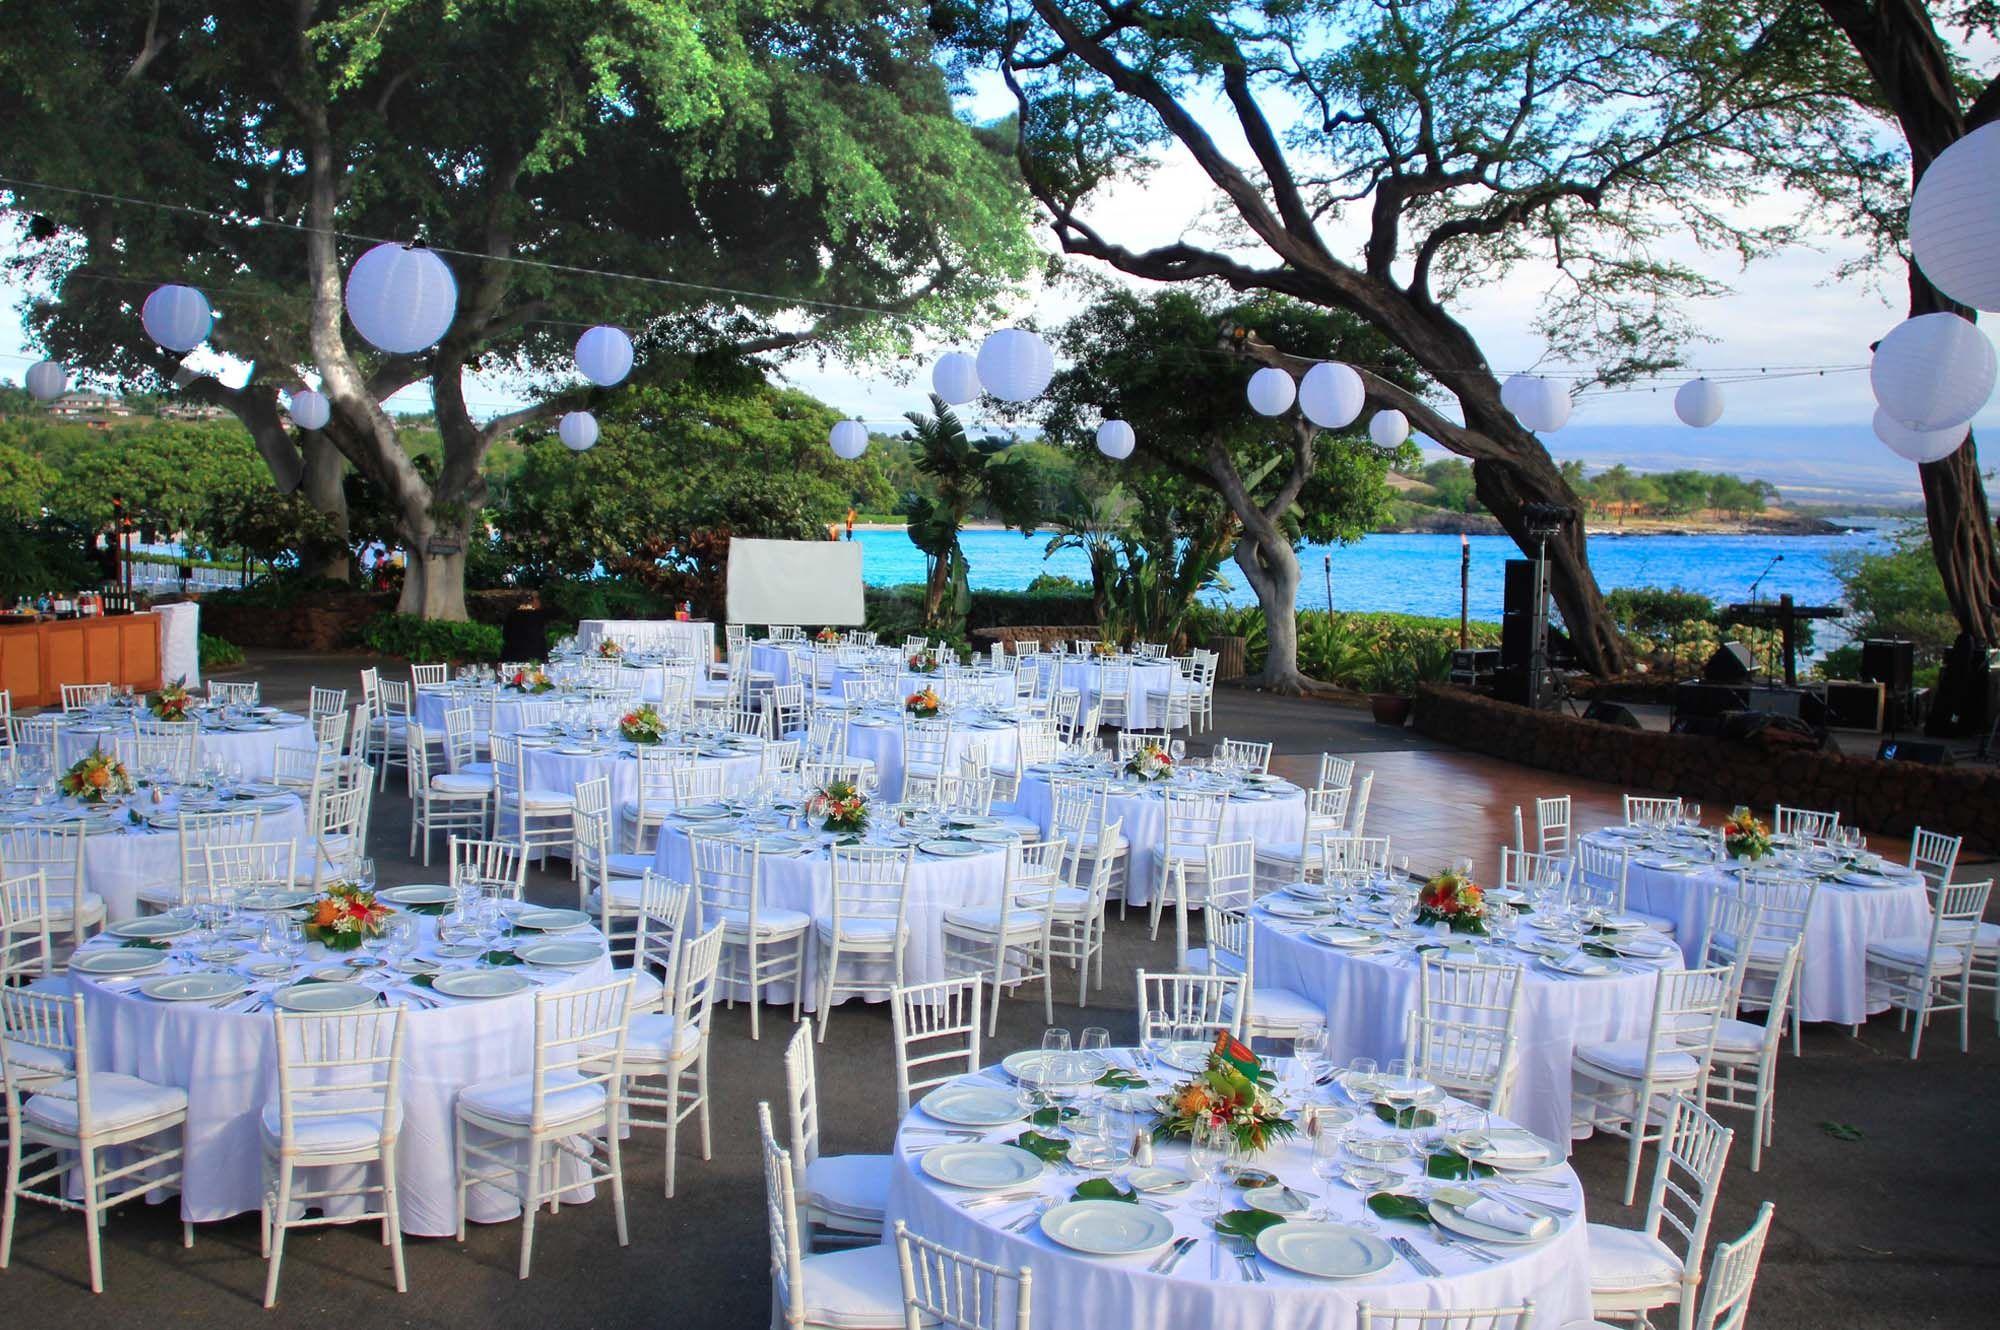 Mauna Kea Beach Hotel Outdoor Wedding Area Wedding Venues